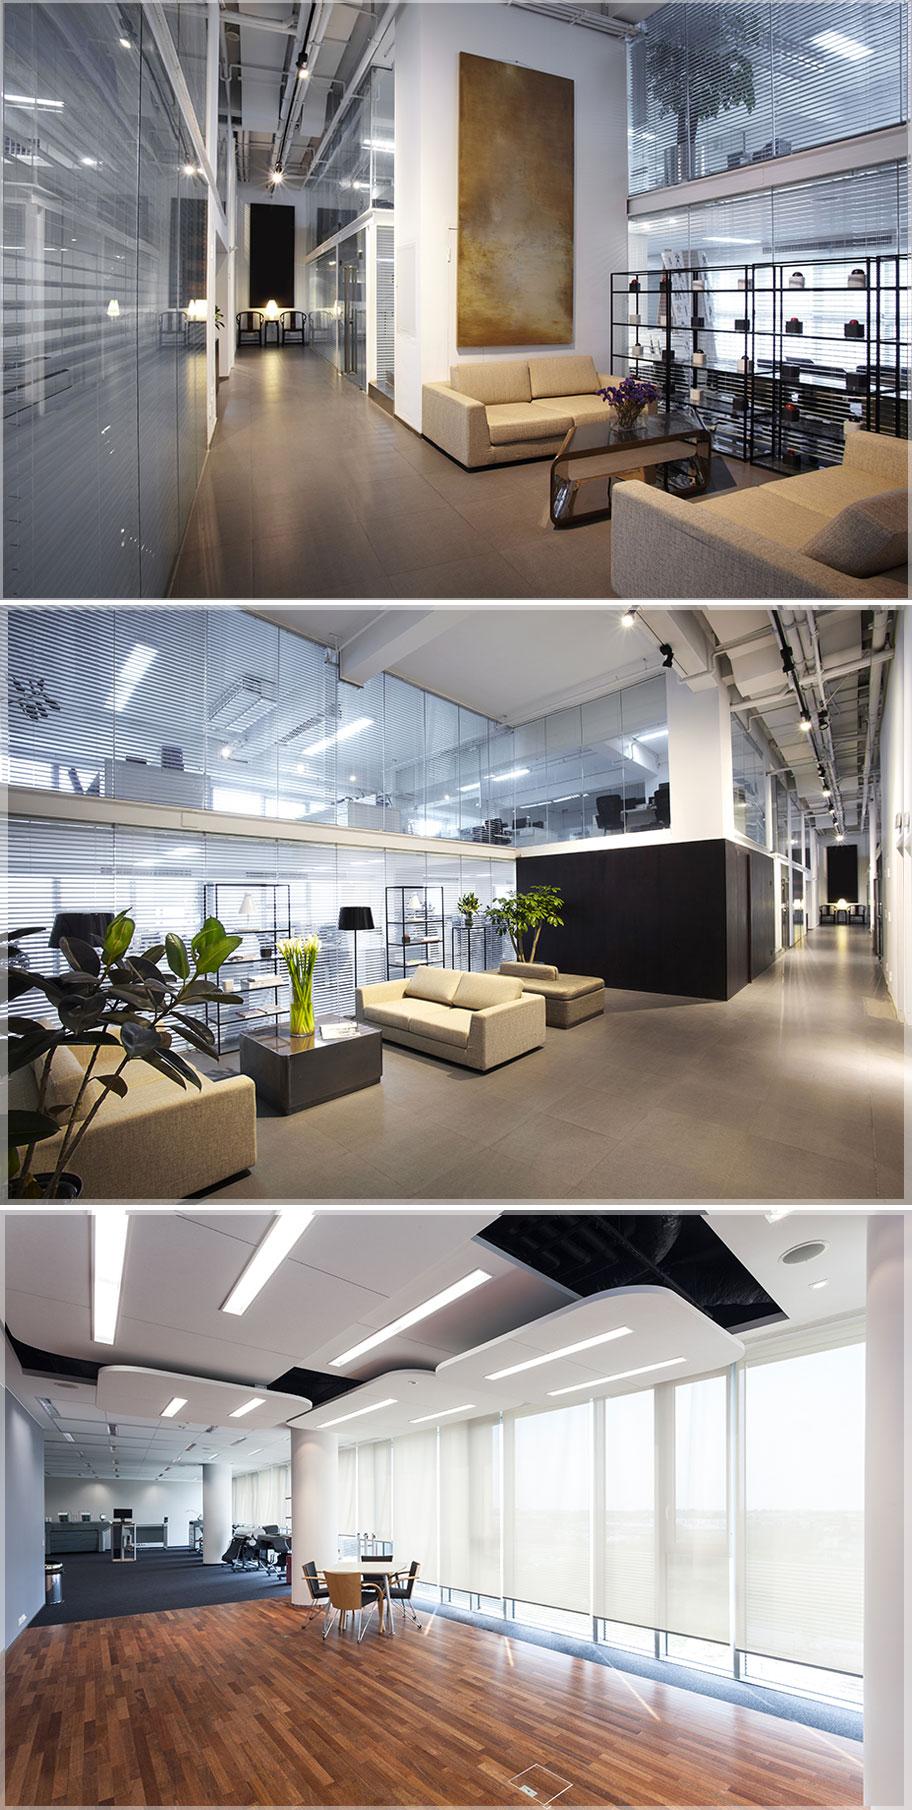 contoh desain interior kantor minimalis